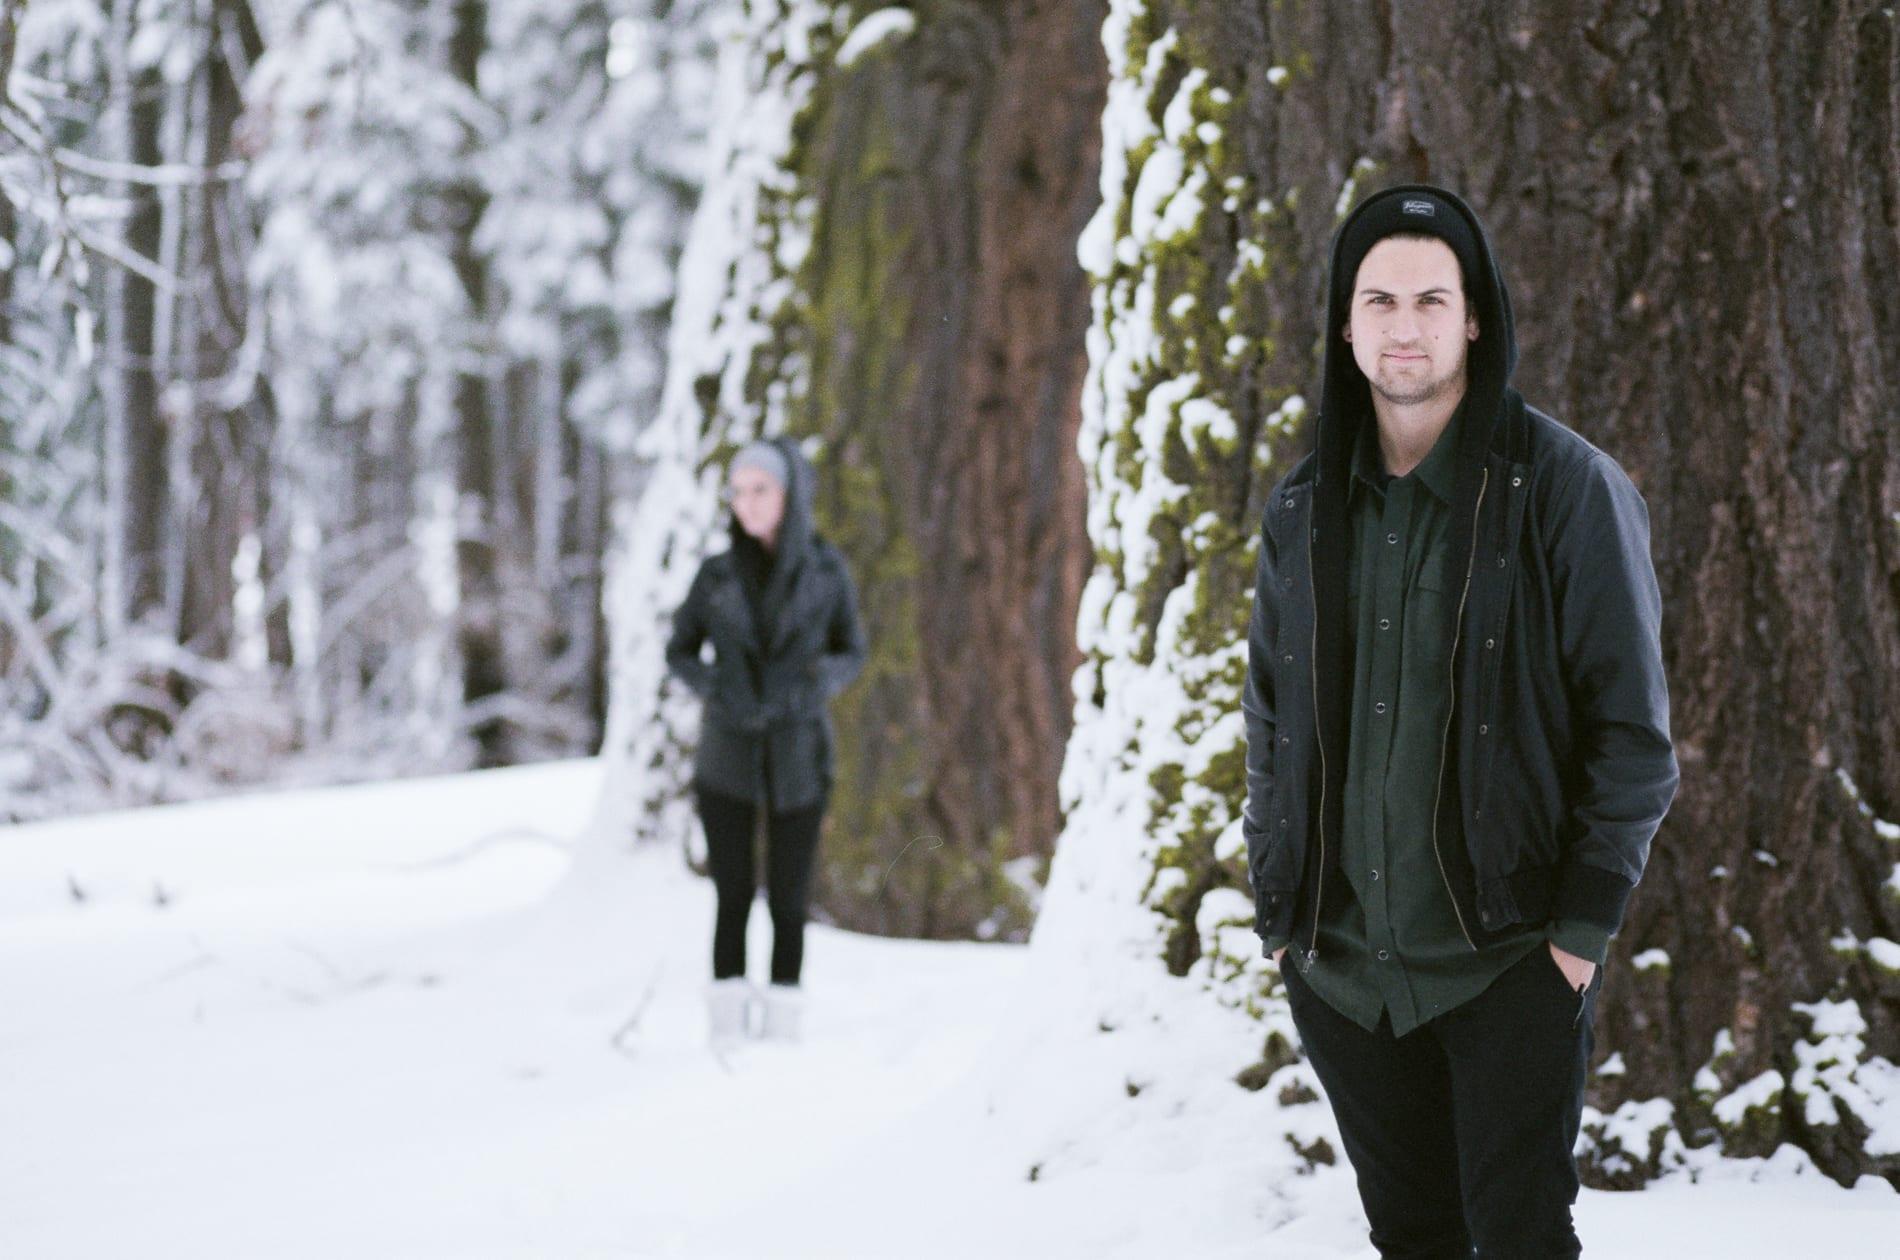 mt-lassen-winter-snow-couples-photo-21